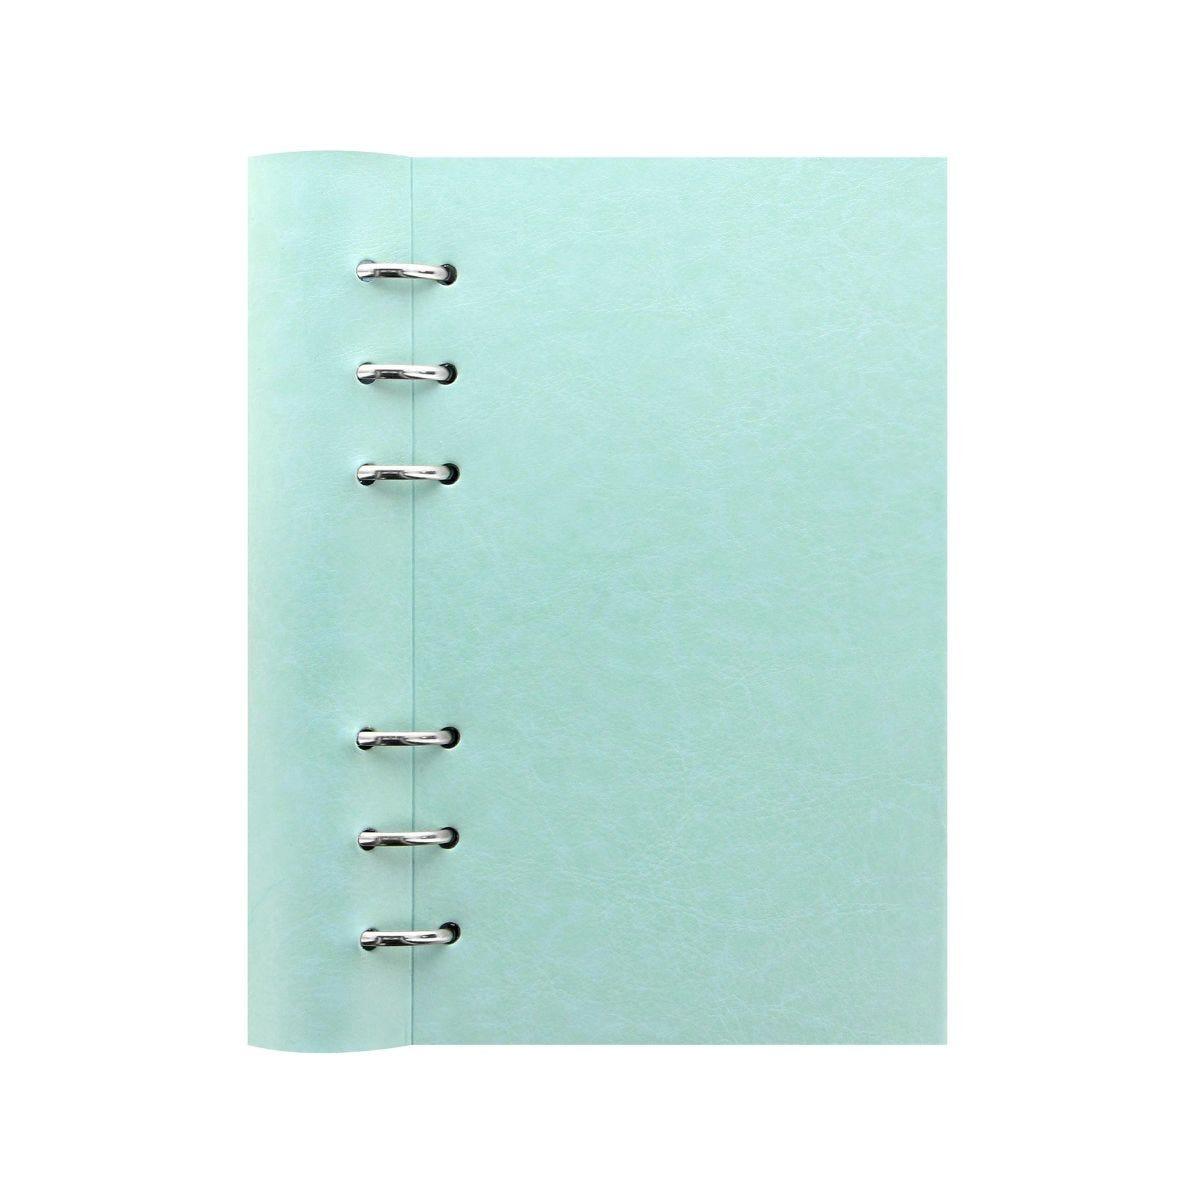 Filofax Refillable Clipbook Planner Personal Duck Egg